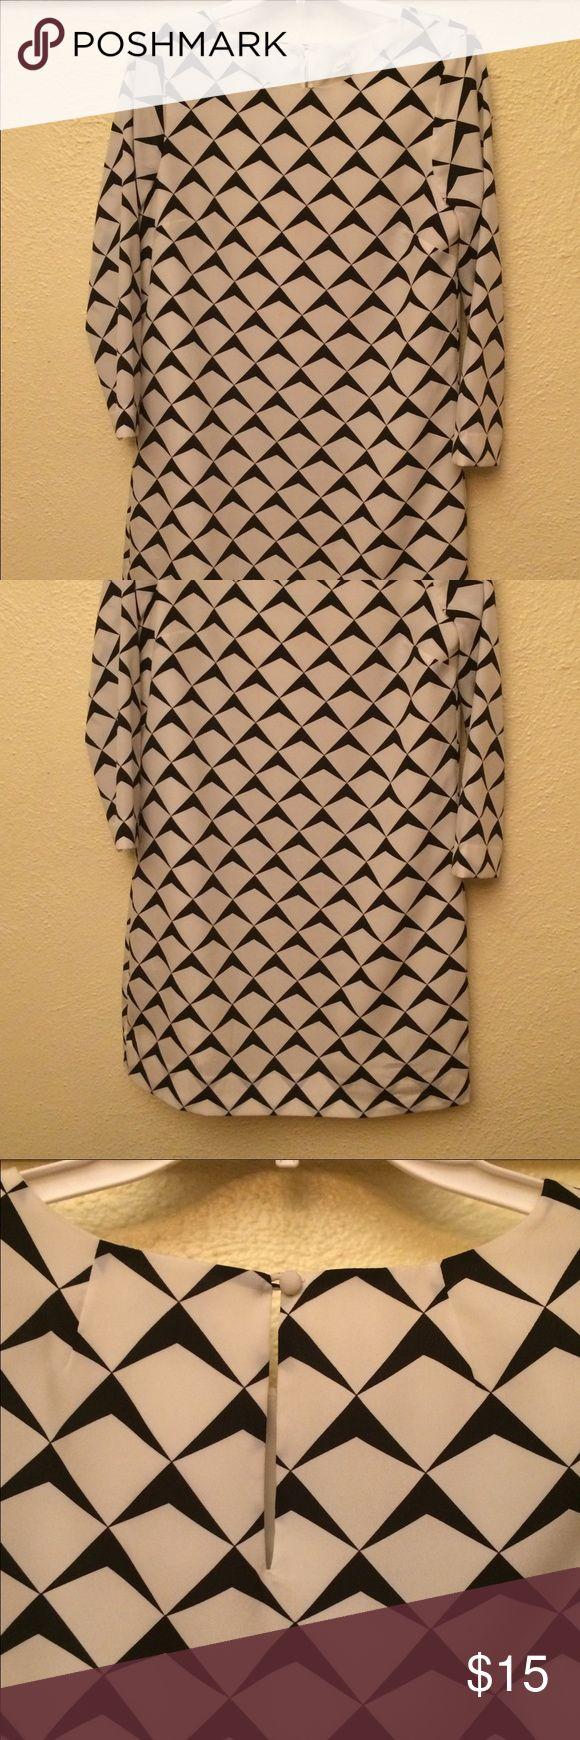 J Crew sack dress Black and cream patterned sack dress. Size 4. Worn once. J Crew Dresses